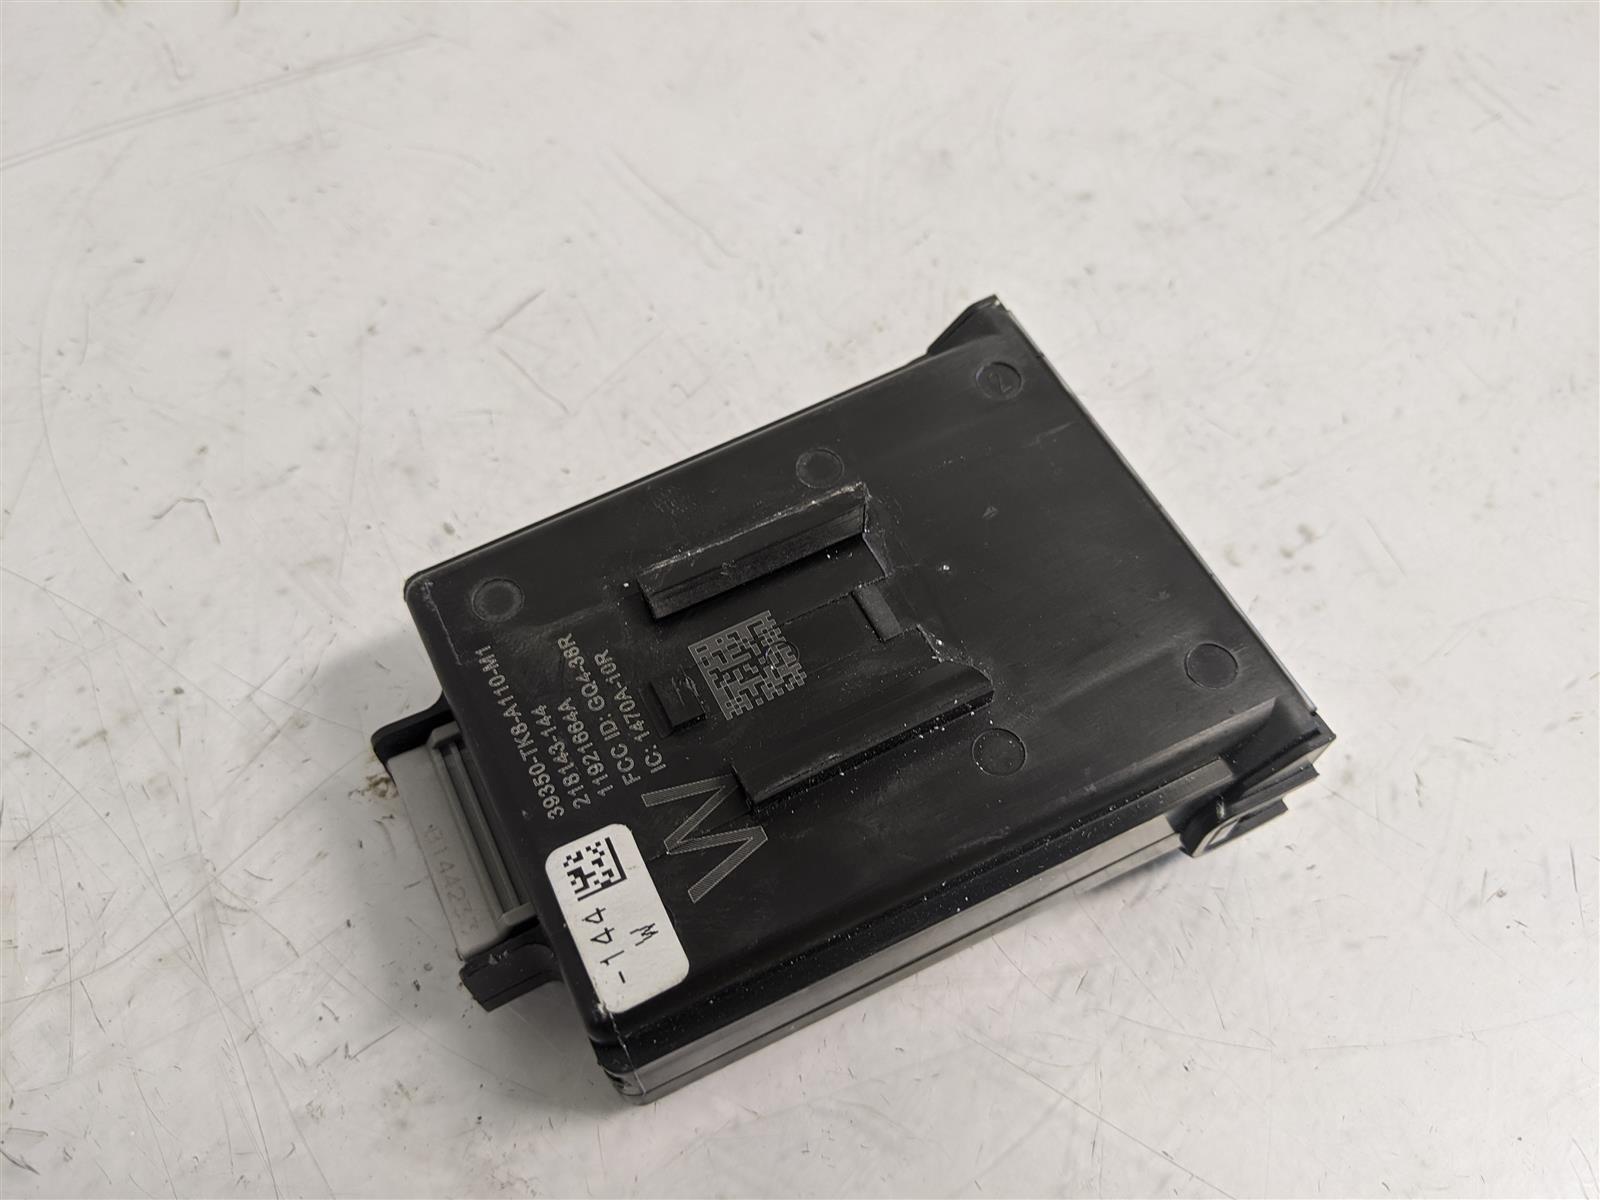 2014 Honda Odyssey Suspension Control Unit Replacement